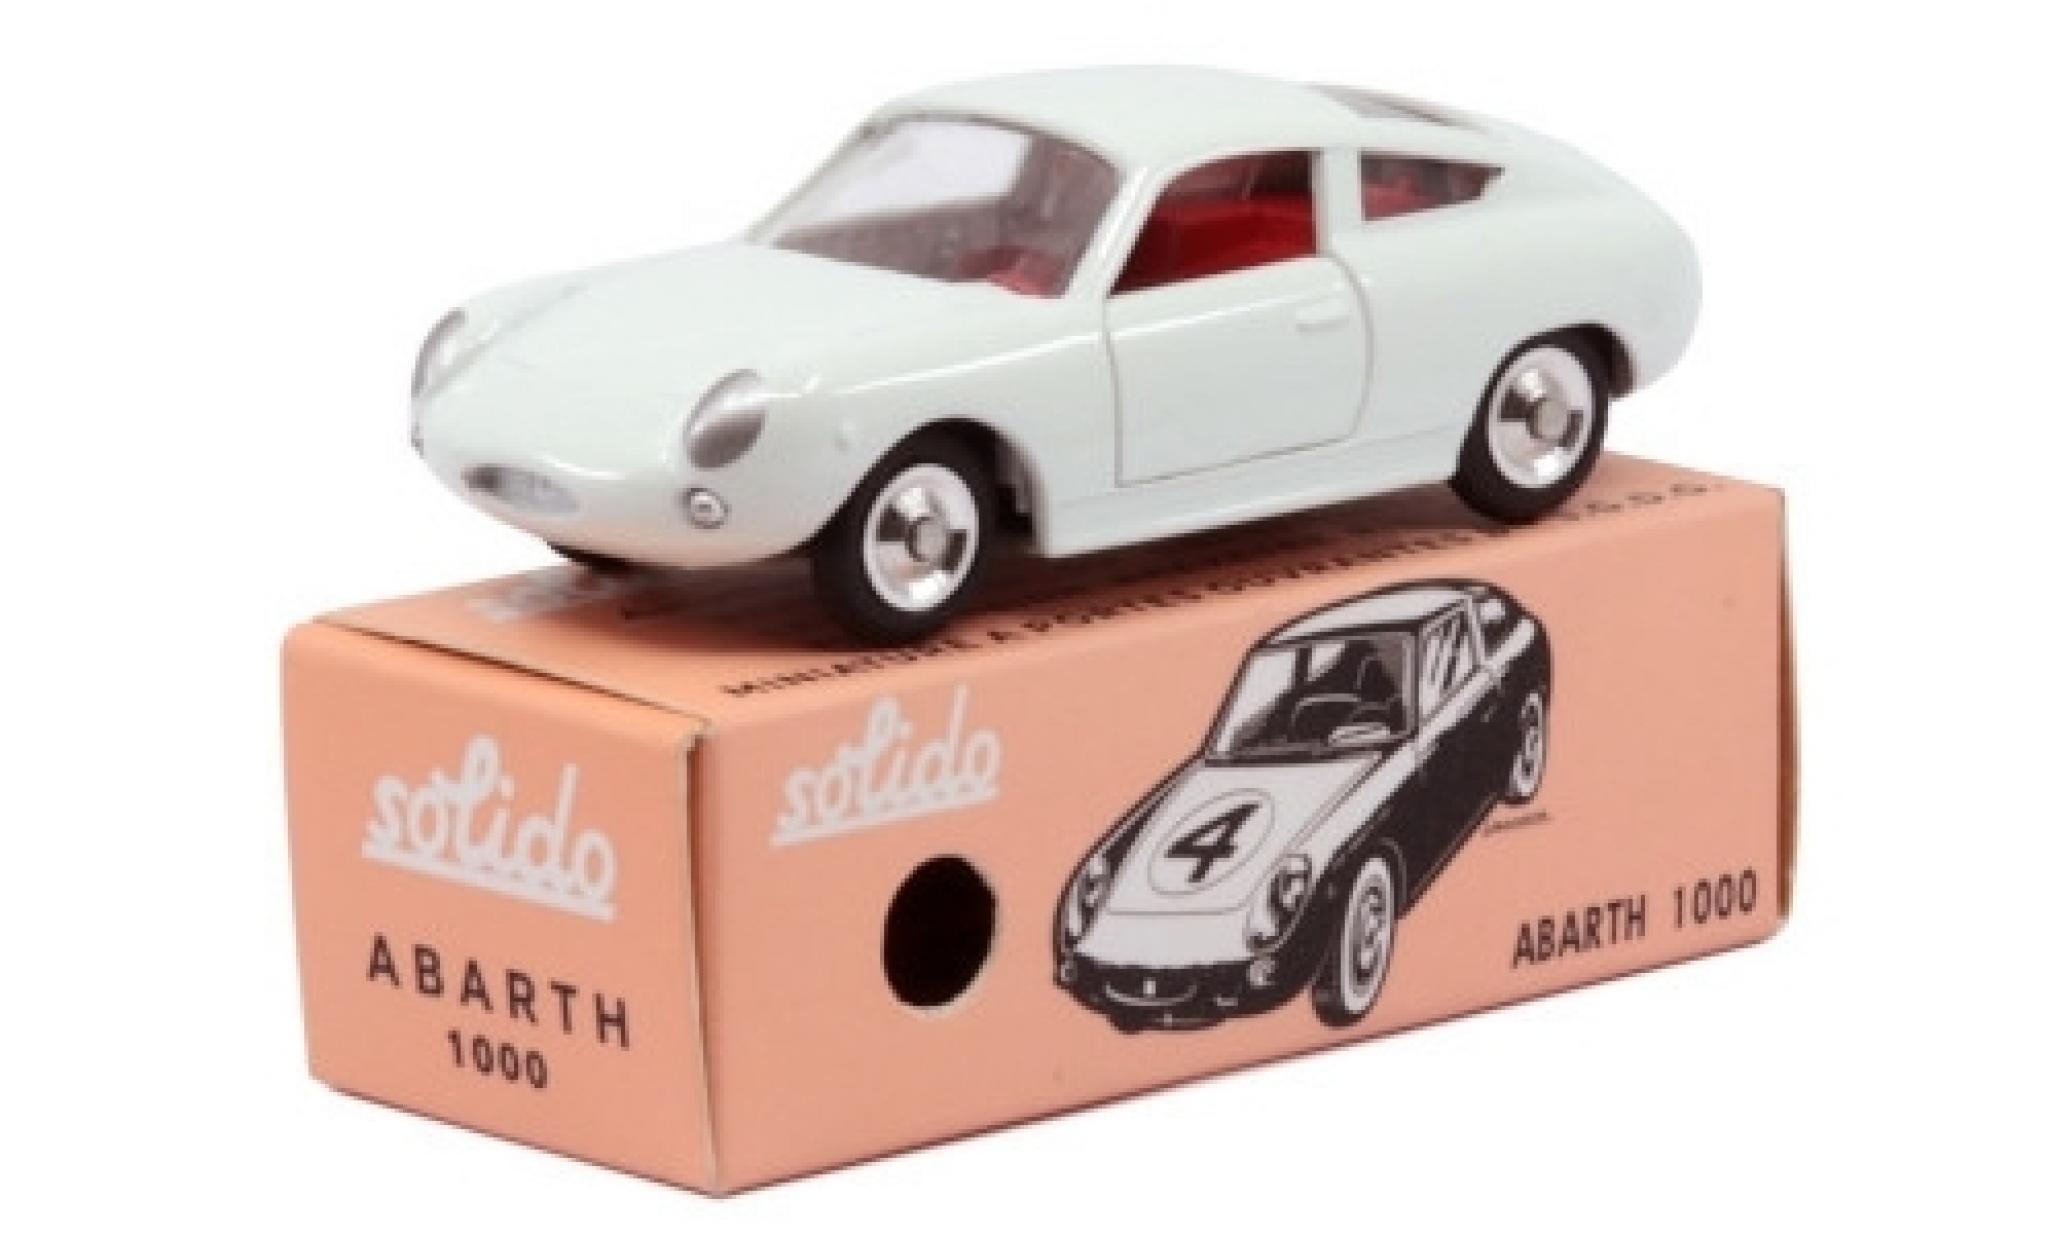 Fiat Abarth 1000 1/43 Solido Bialbero white 1966